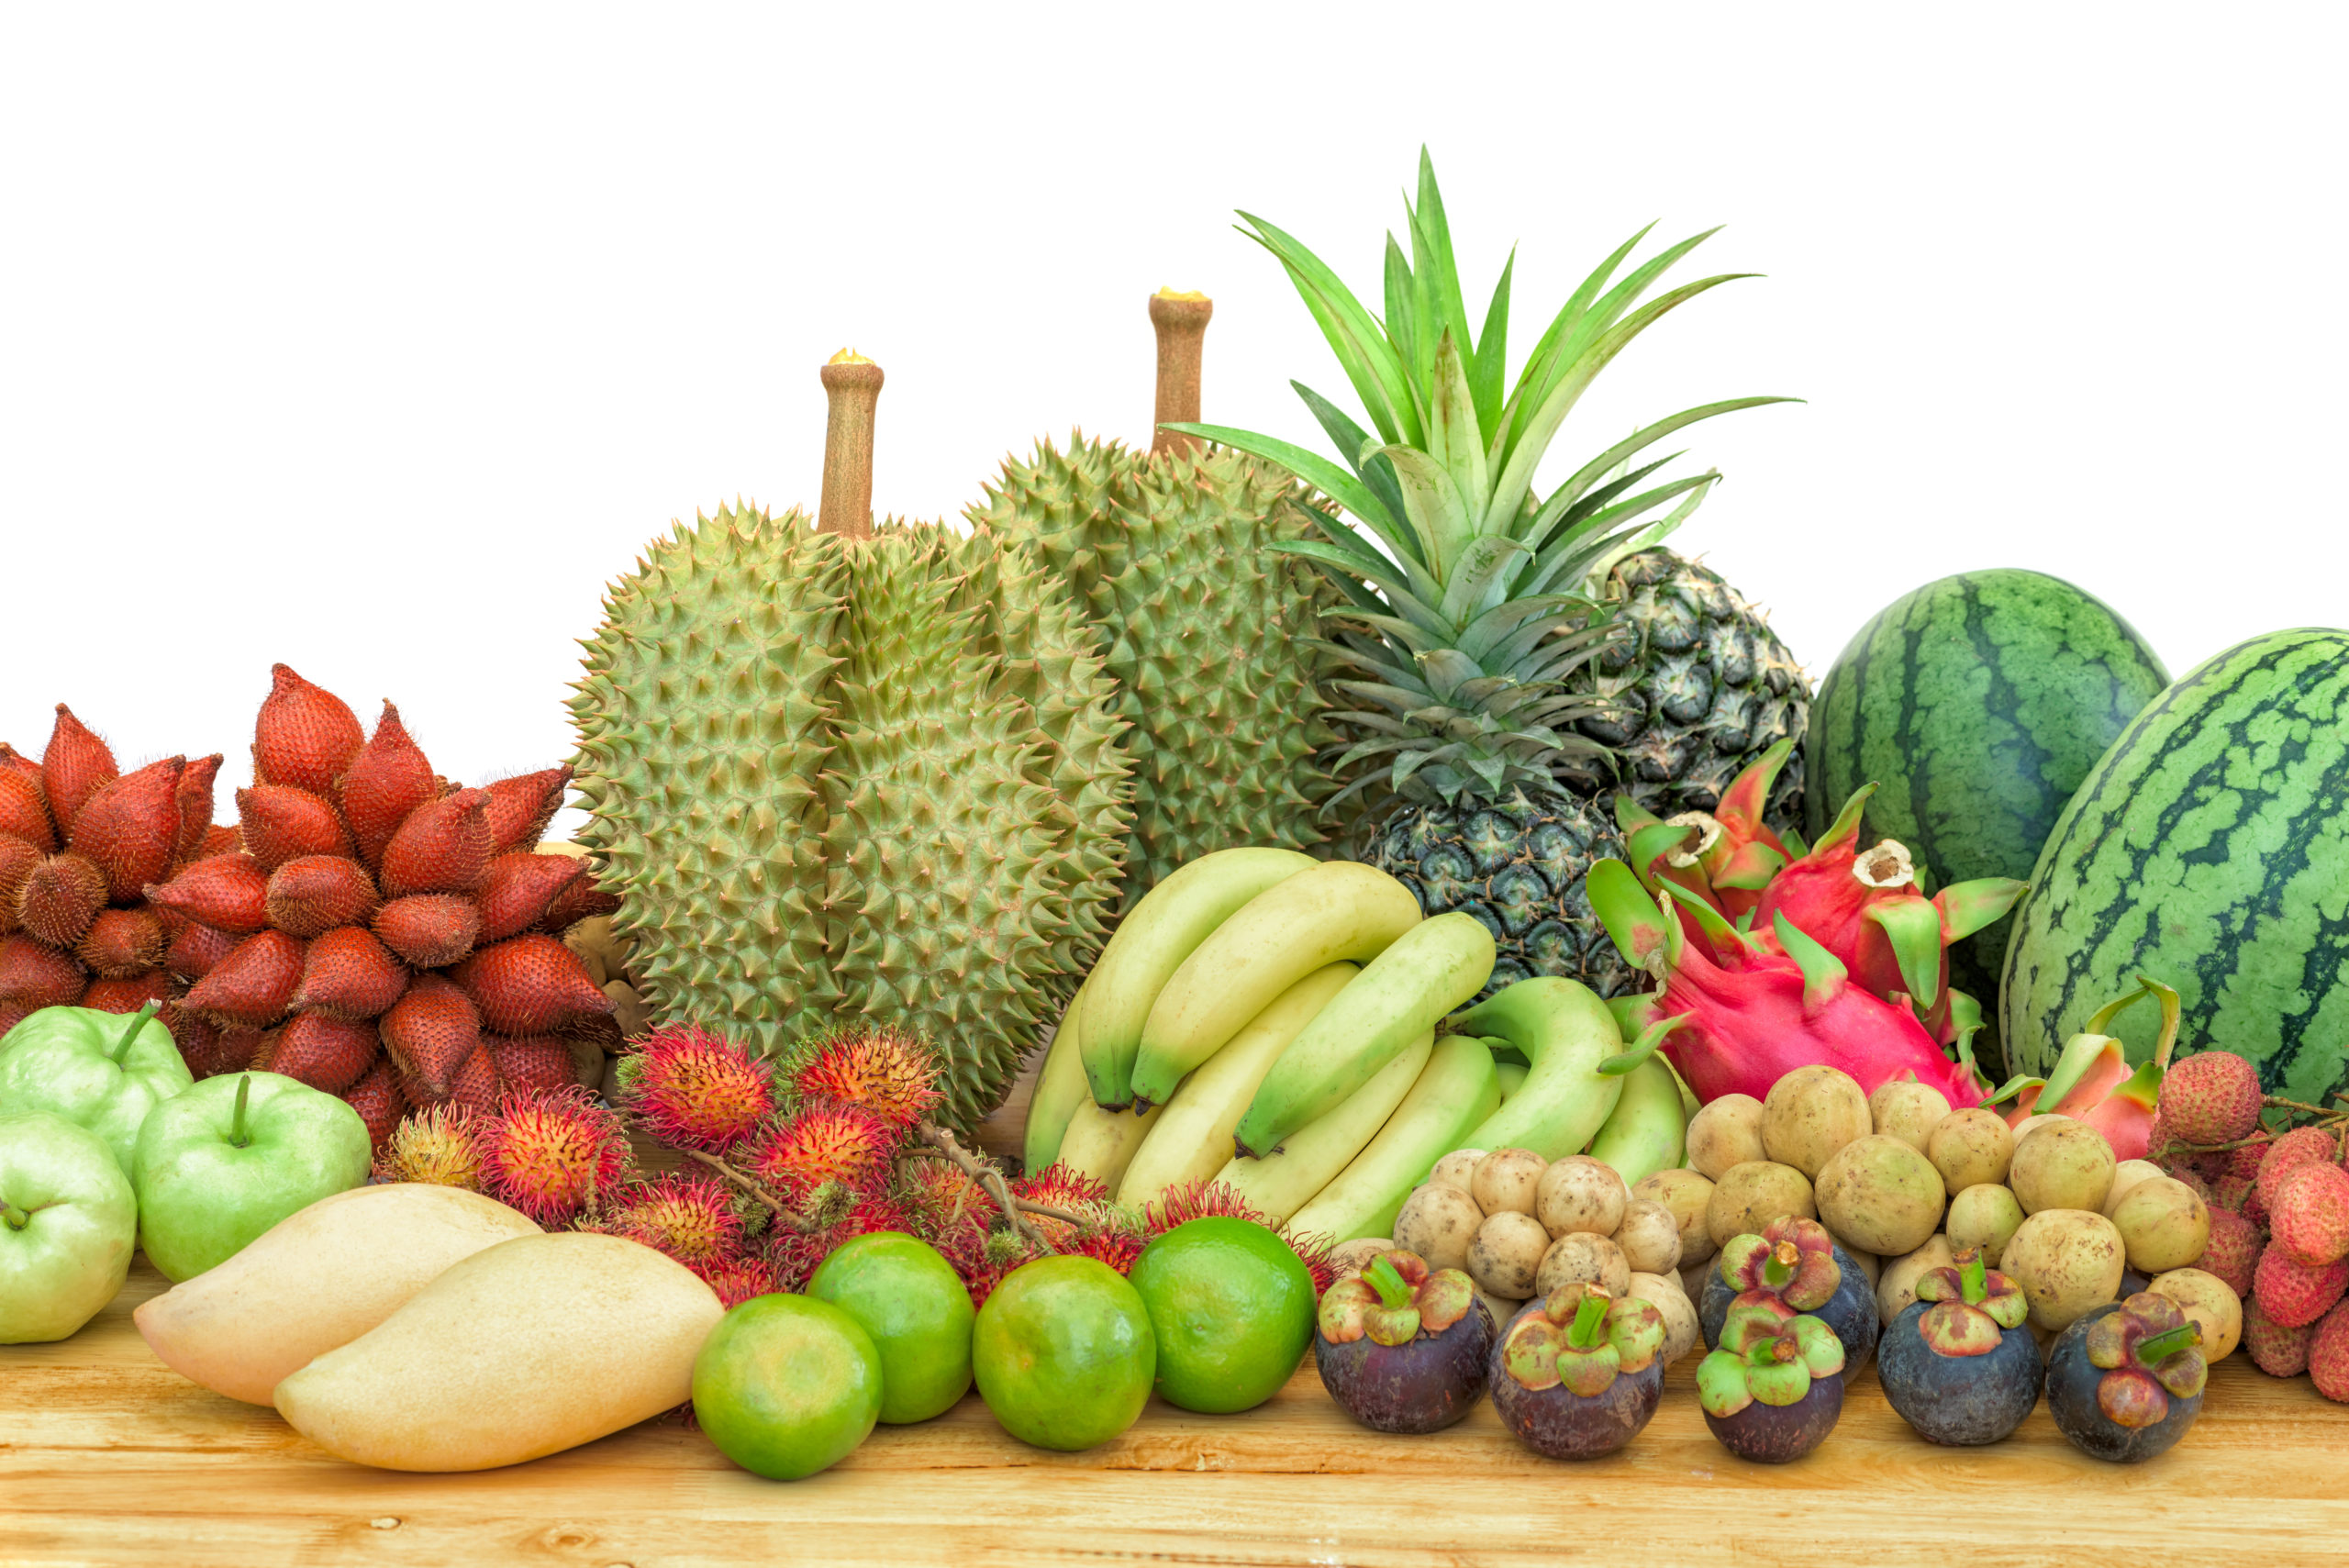 fresh mixed fruits on wood table isolated on white background.